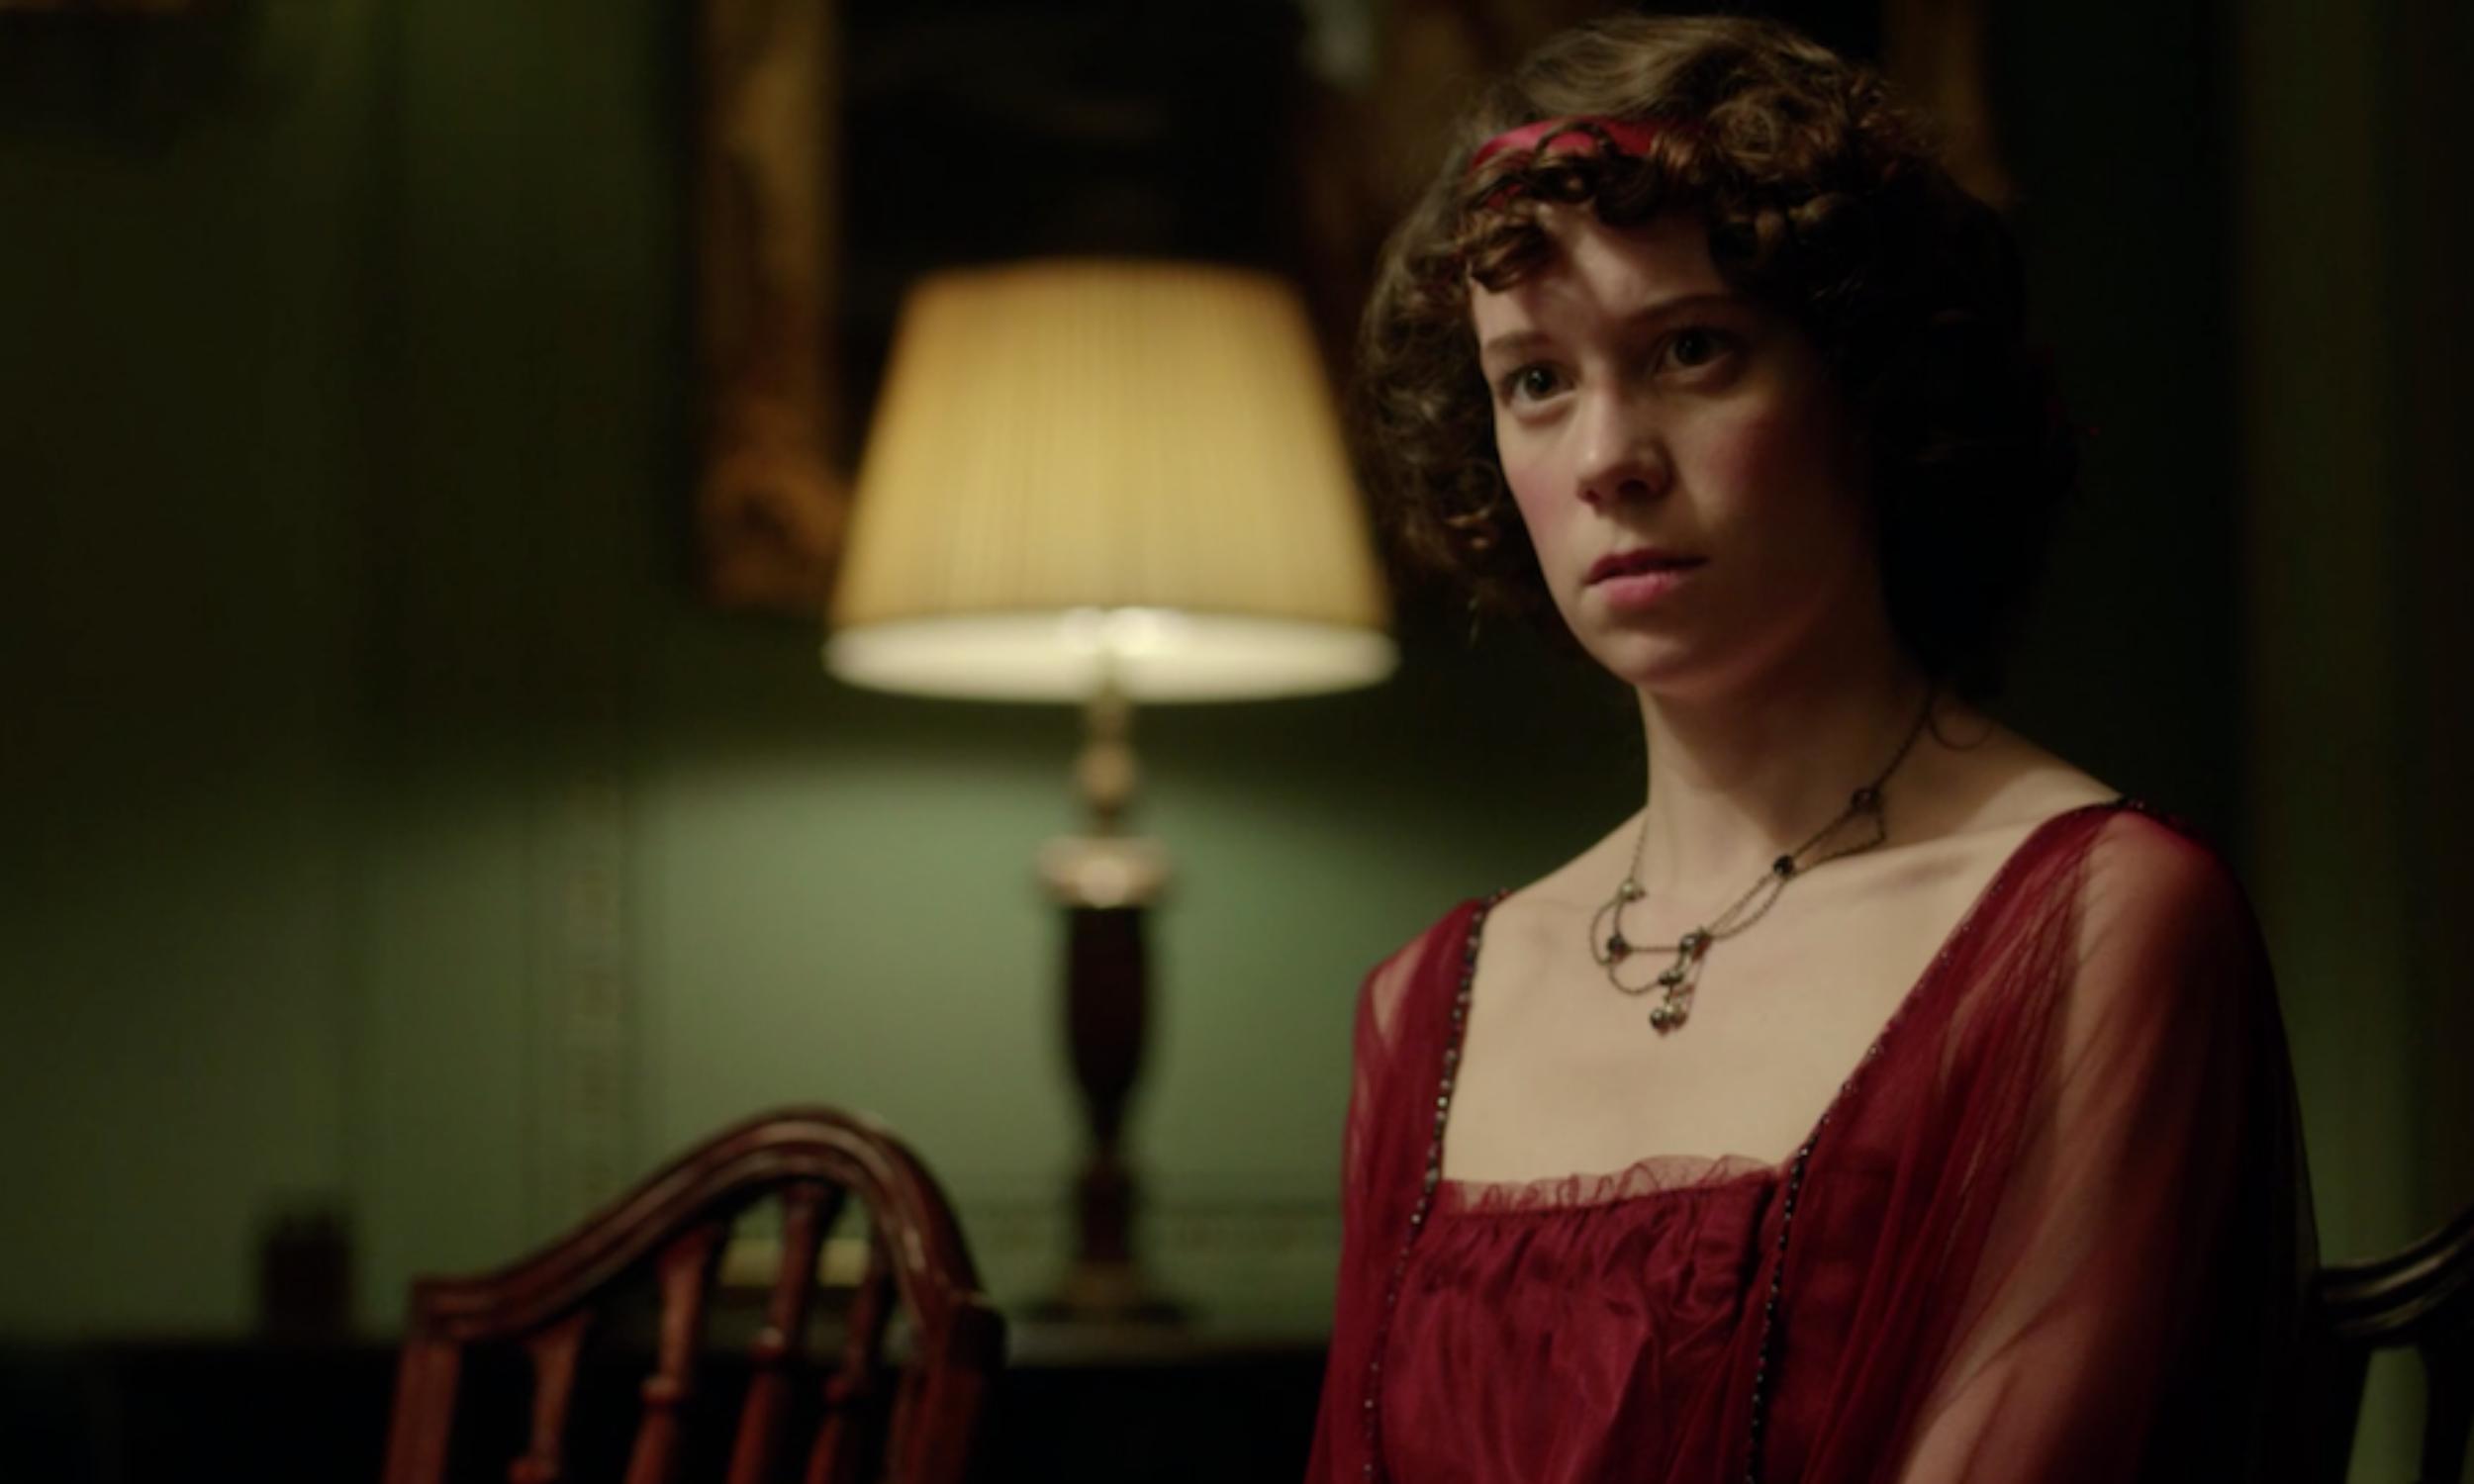 Chloe Pirrie (Sheila) in BBC Studios' An Inspector Calls